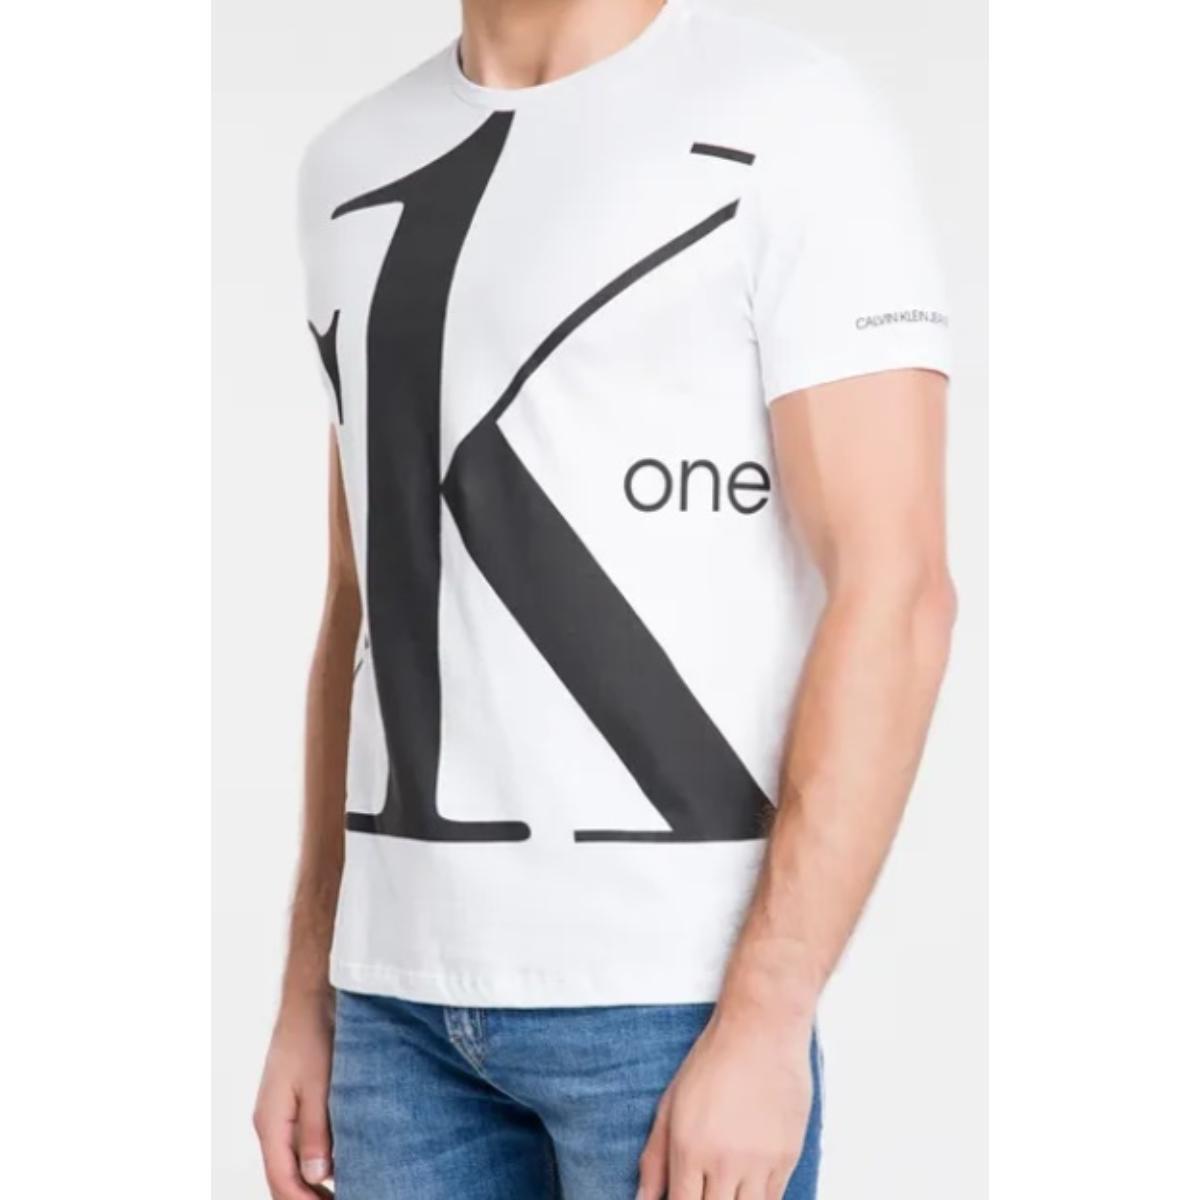 Camiseta Masculina Calvin Klein Cm0ok01tc018 Branco